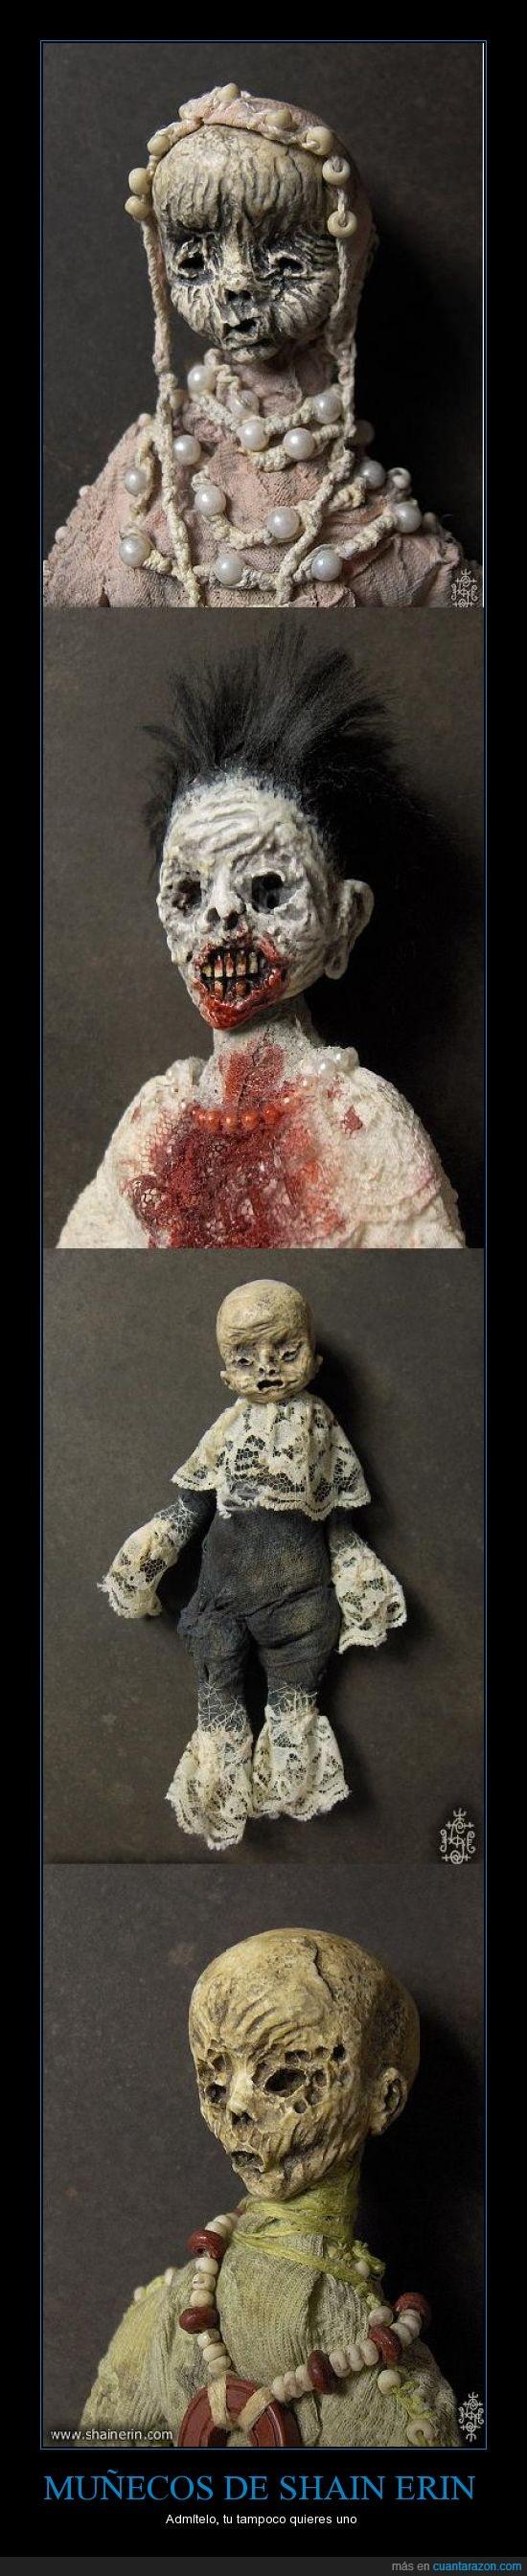 cadáveres,feos,macabros,muñecos,qué miedete,shain erin